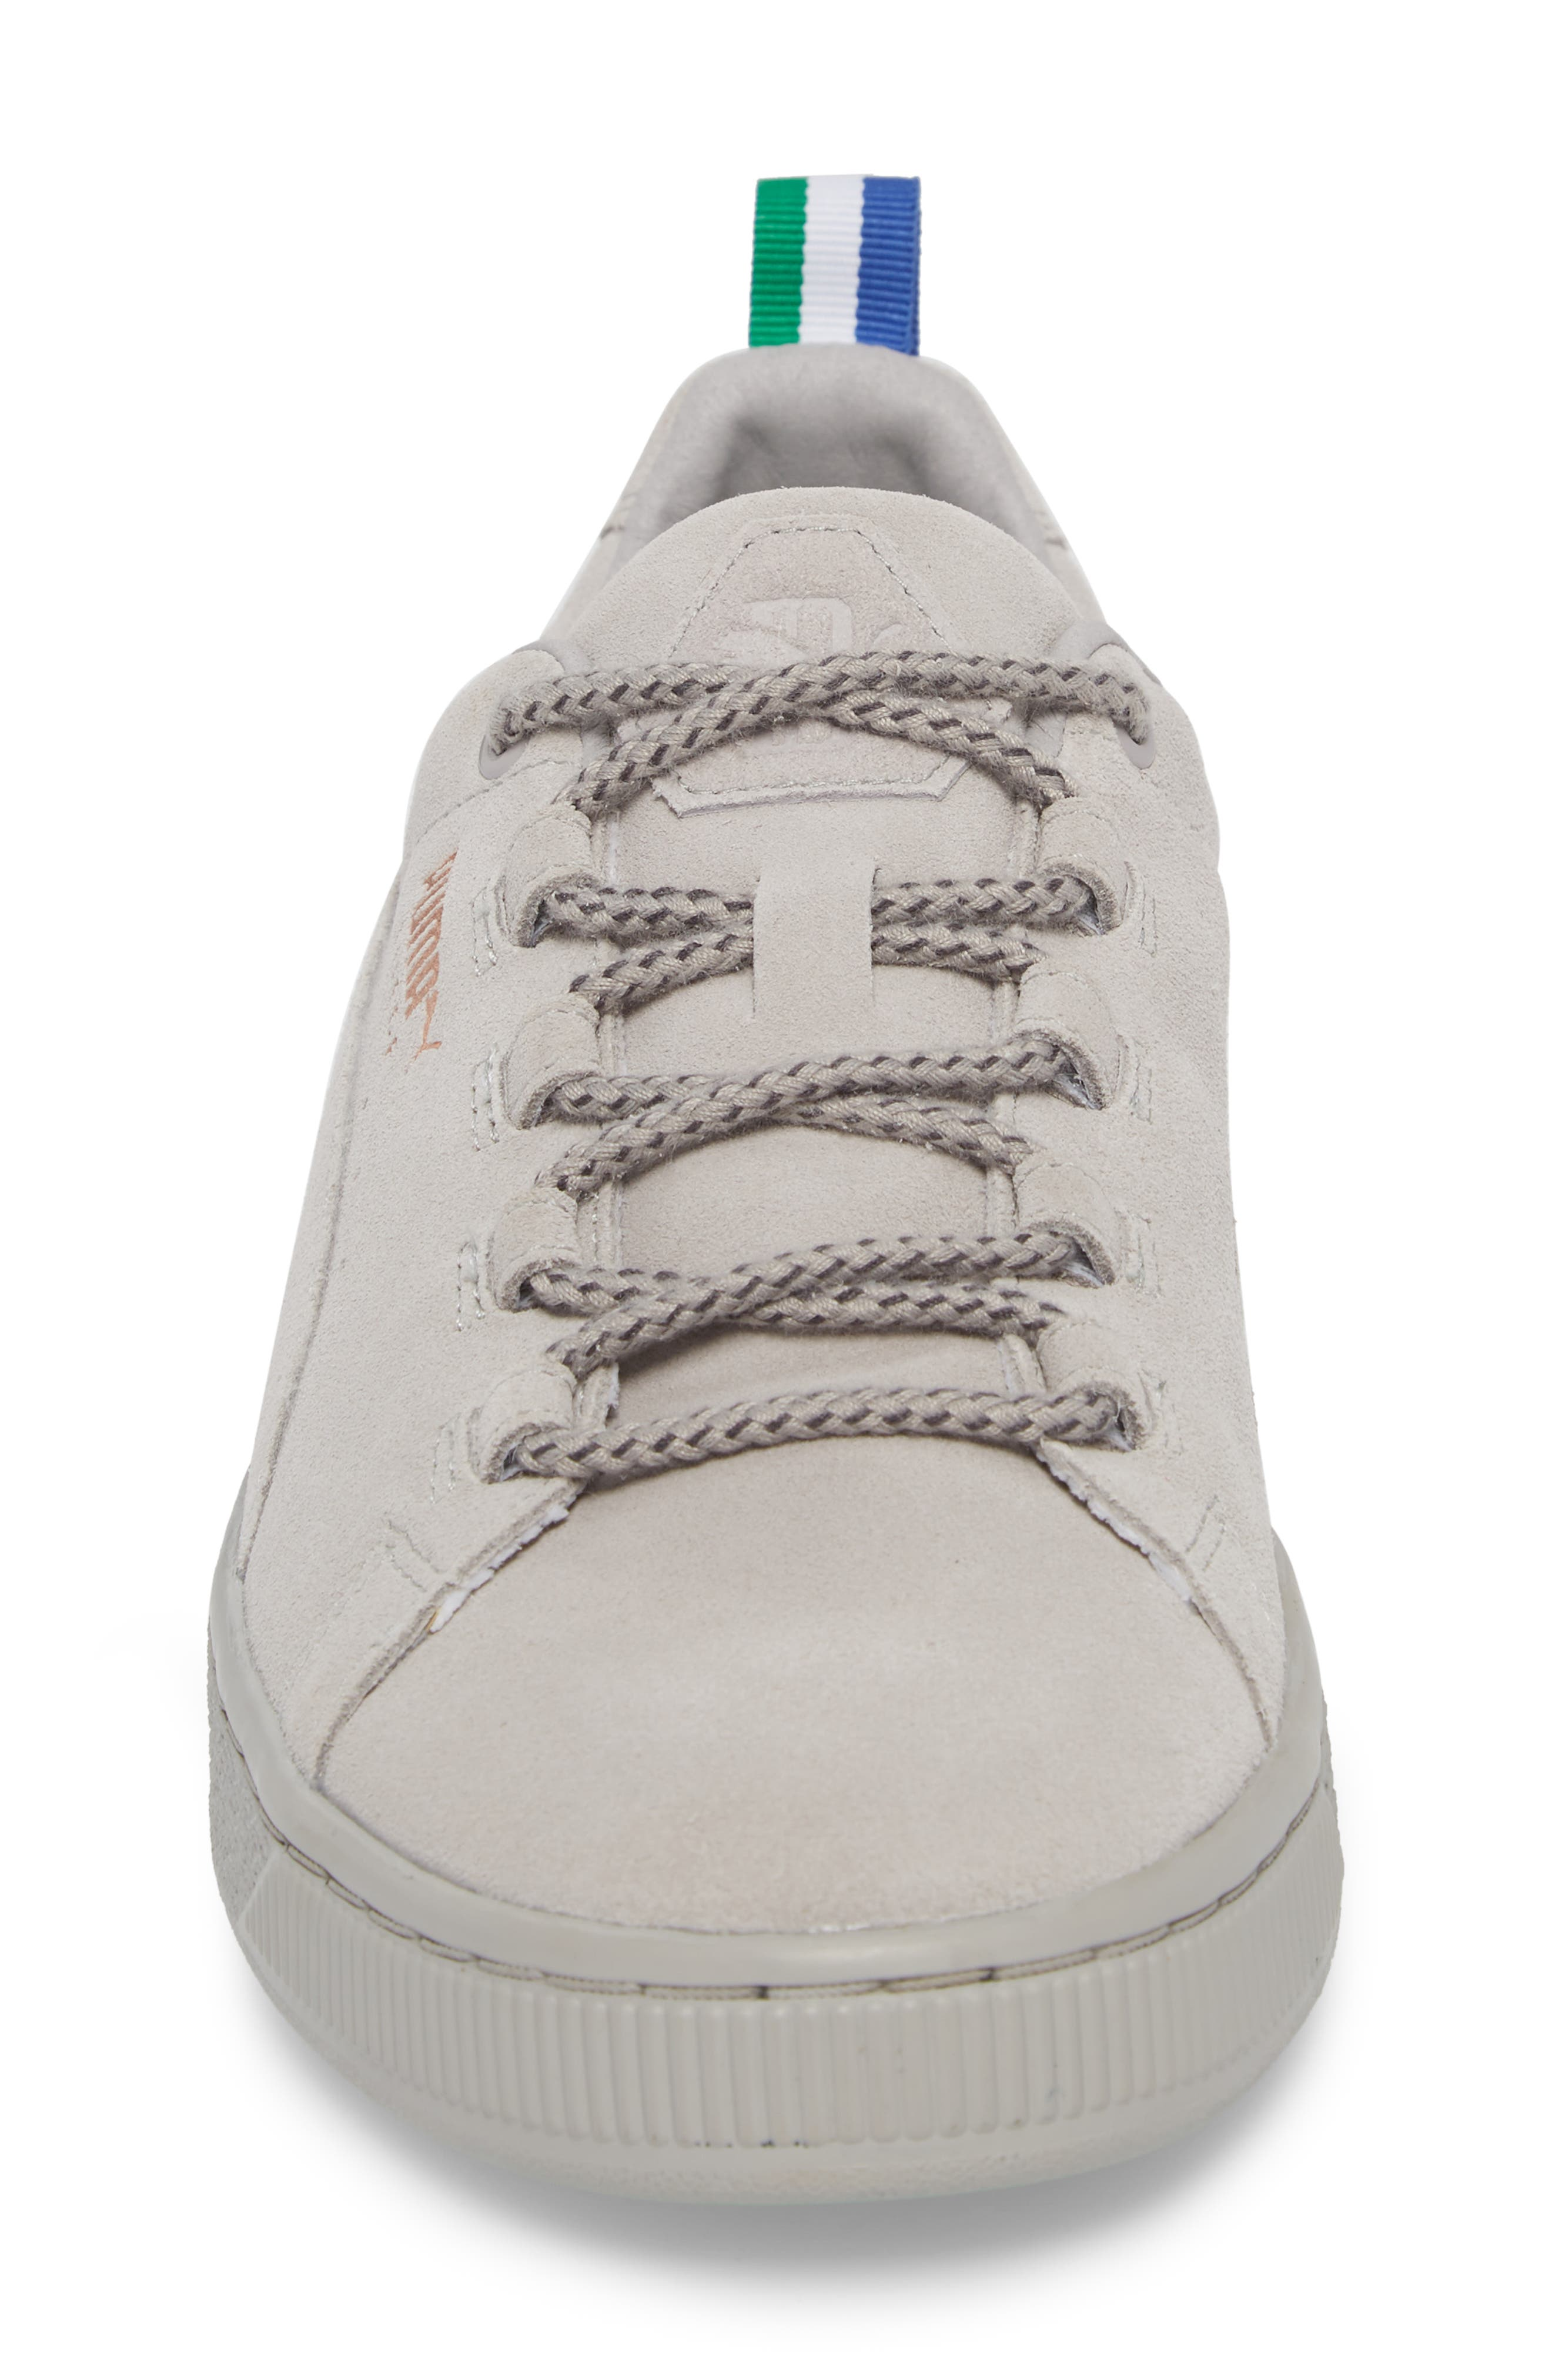 x Big Sean Suede Sneaker,                             Alternate thumbnail 4, color,                             Ash Leather/ Suede